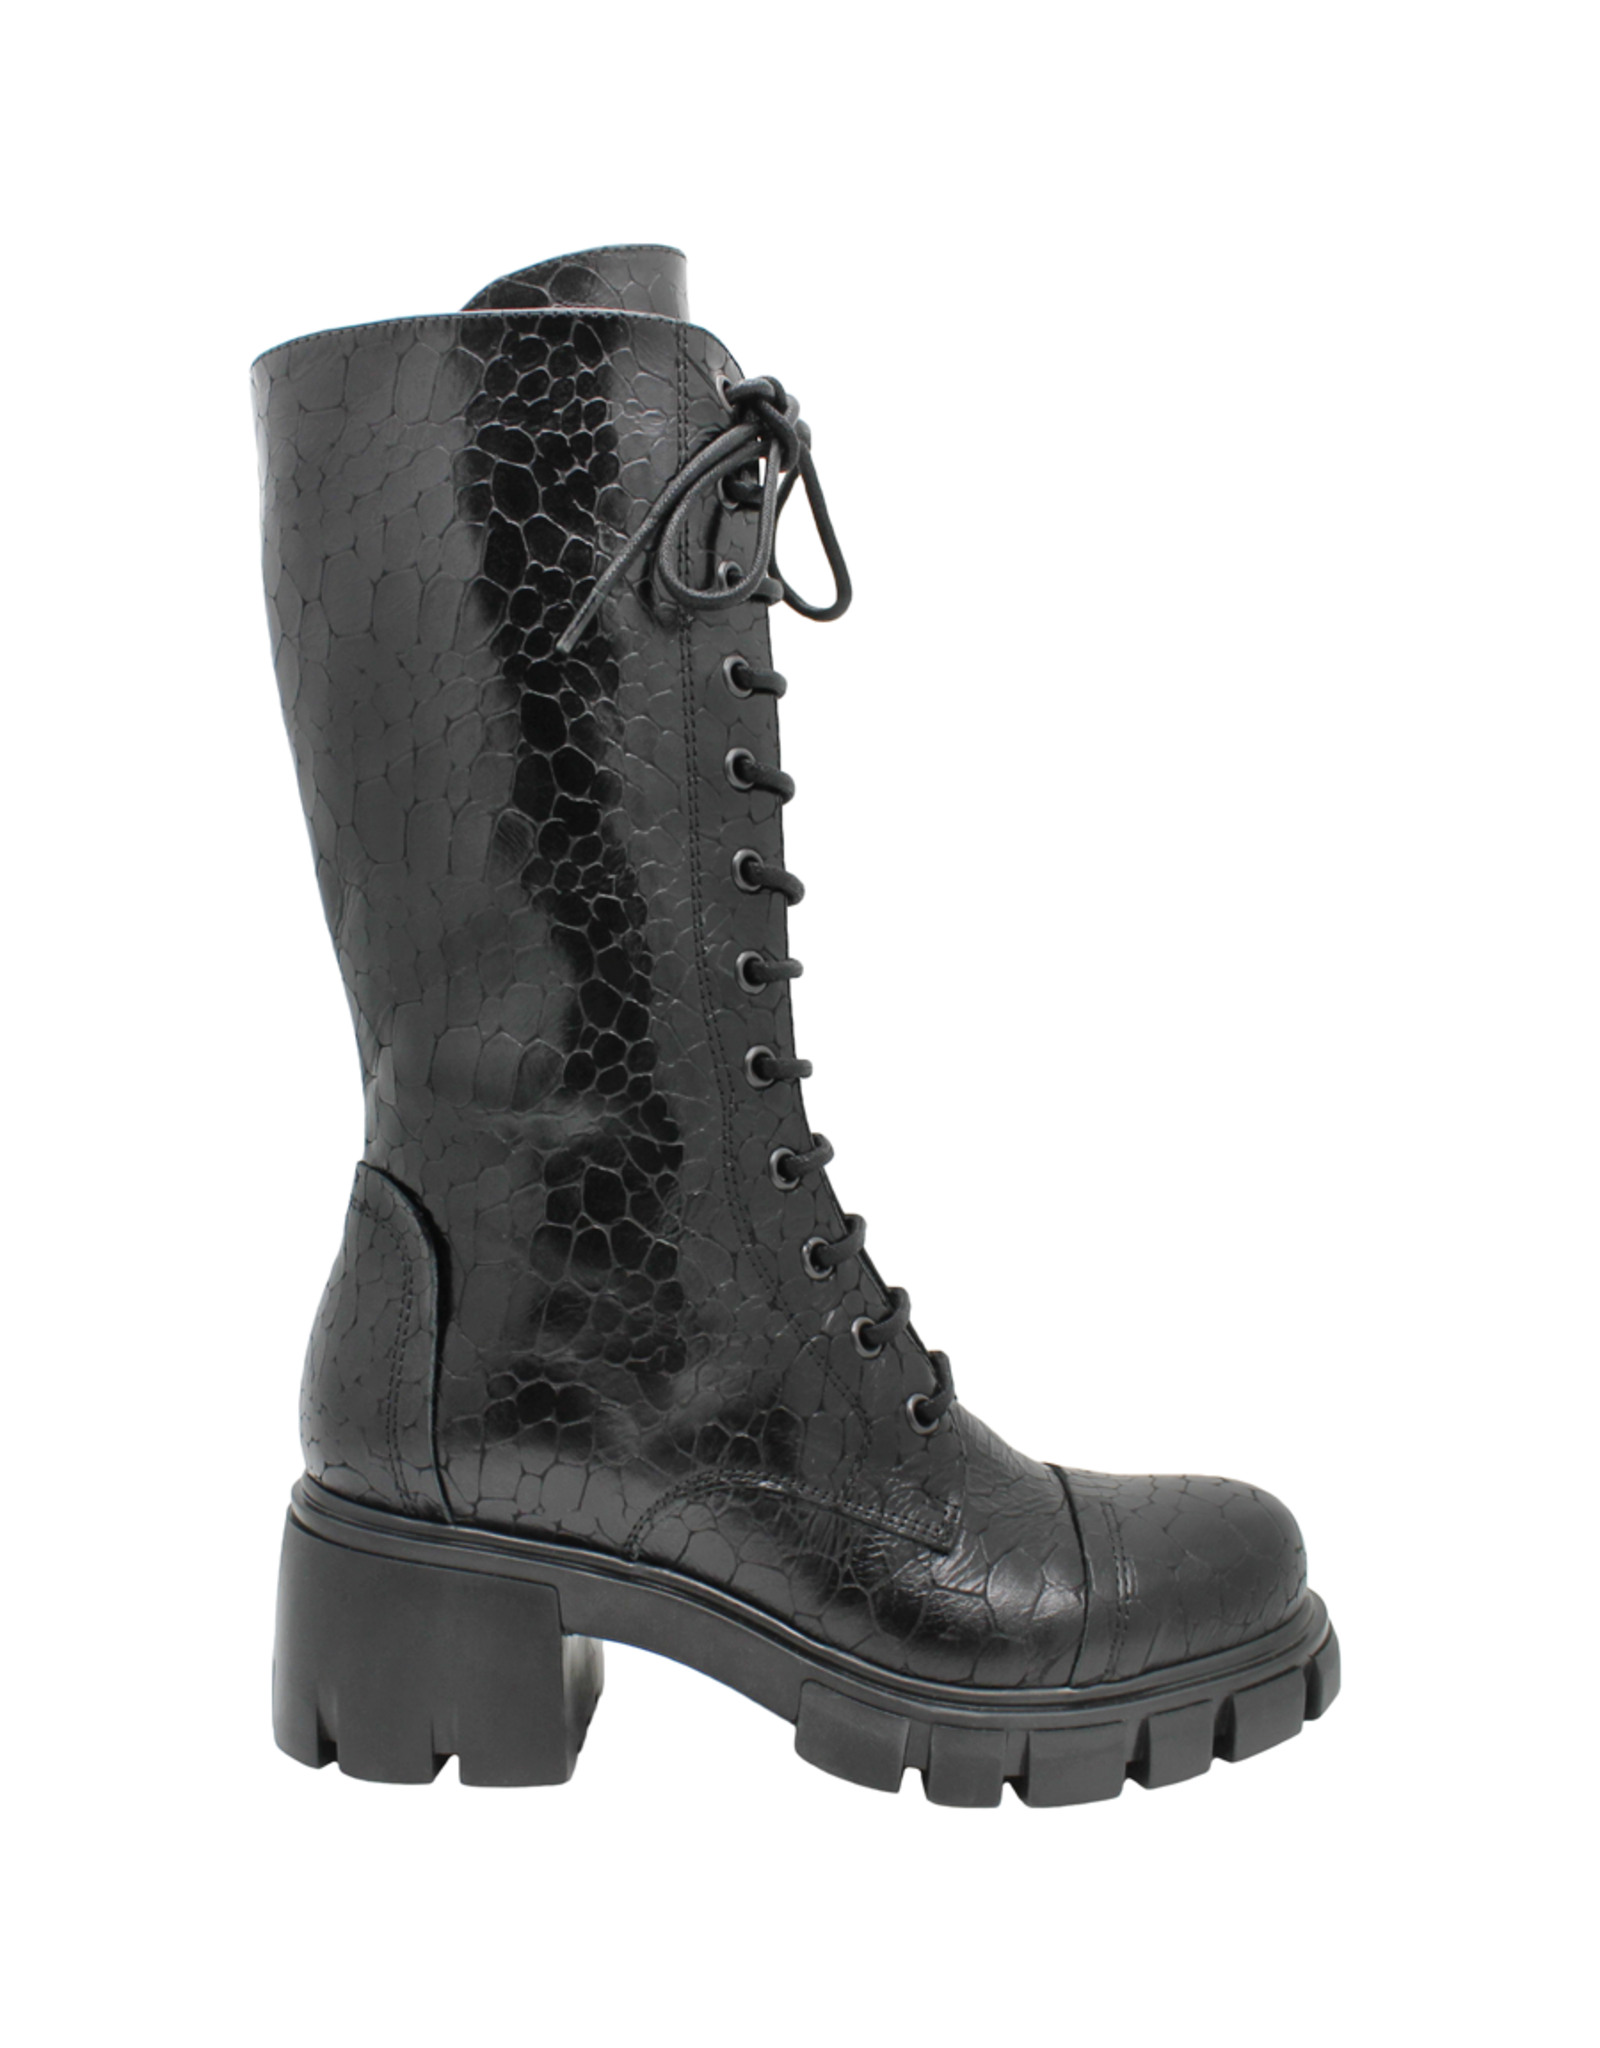 Now Now Black Croc Lace-Up Mid-Calf 7055